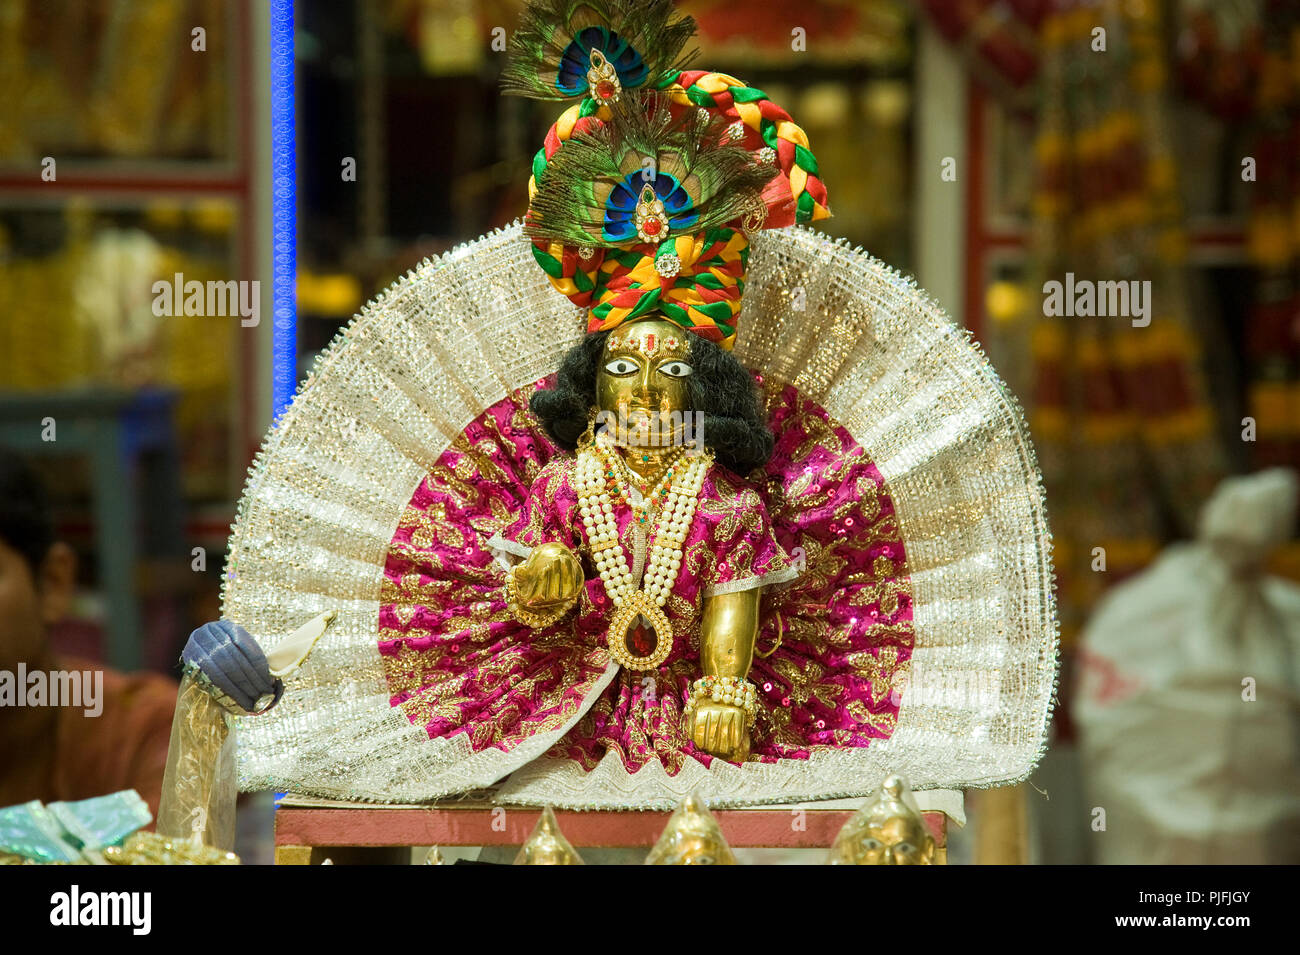 market of temple item laddu gopal or baby krishna or bal gopal at vrindavan mathura uttar pradesh india asia south asia PJFJGY